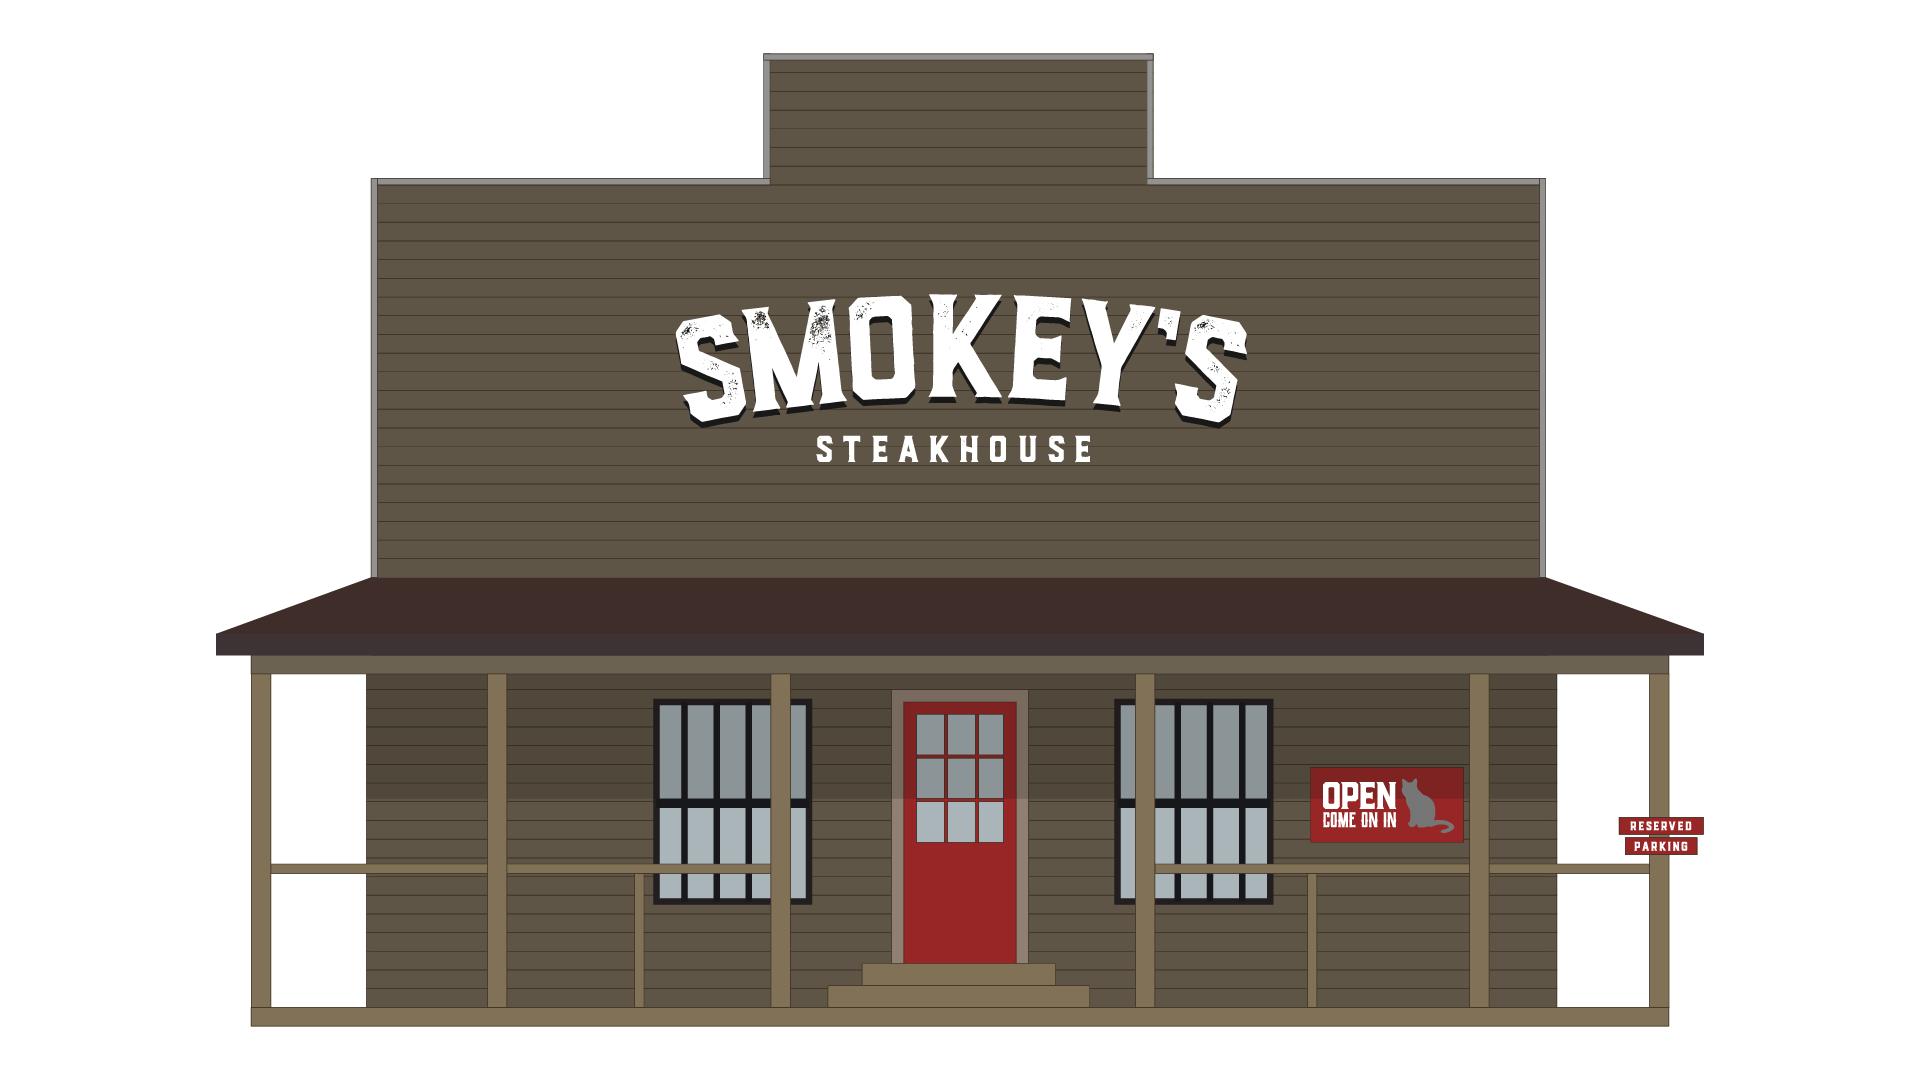 Smokeys.illustration 01